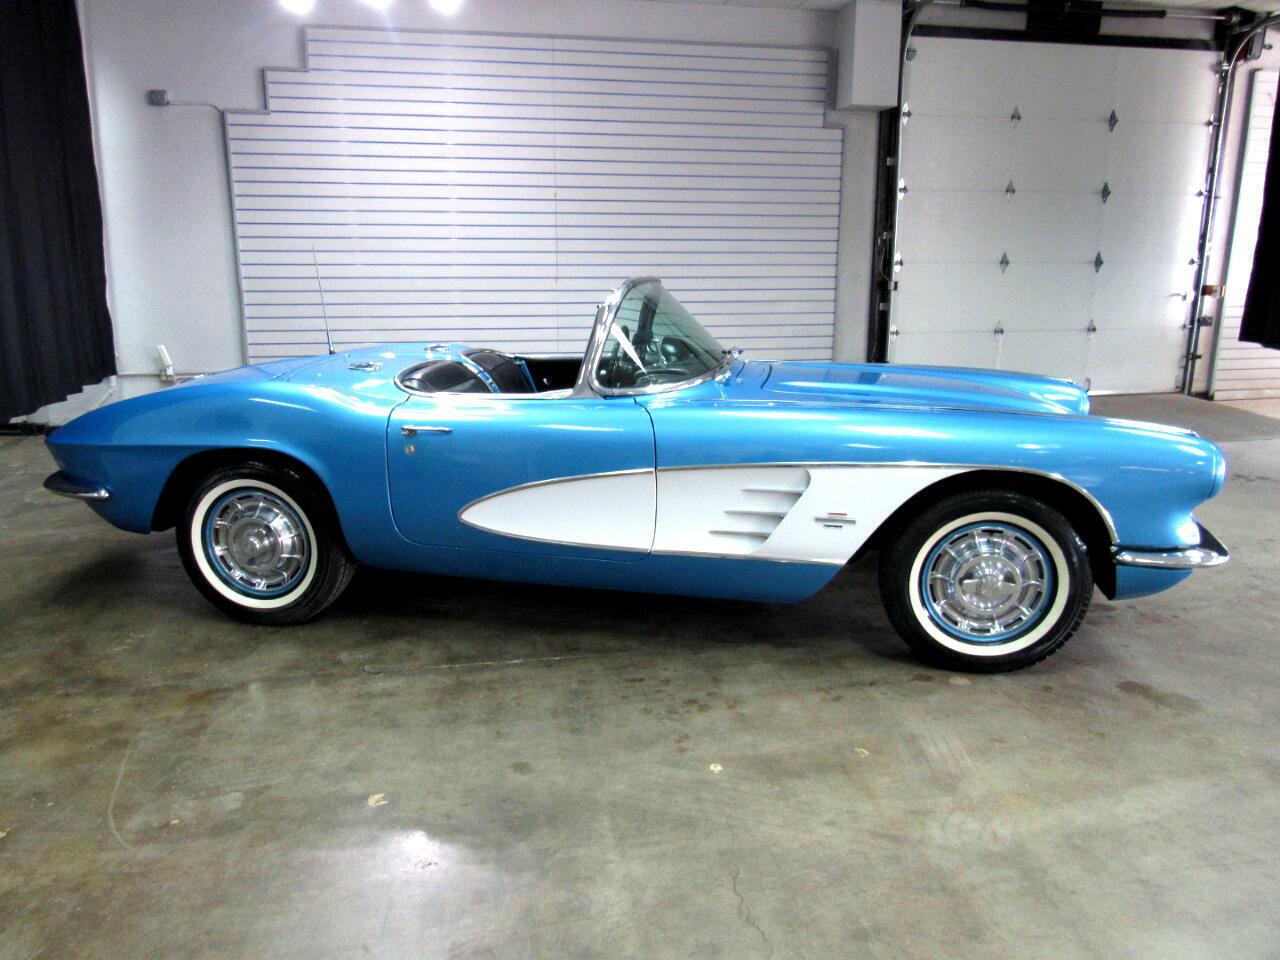 1961 Blue Chevrolet Corvette   | C1 Corvette Photo 4